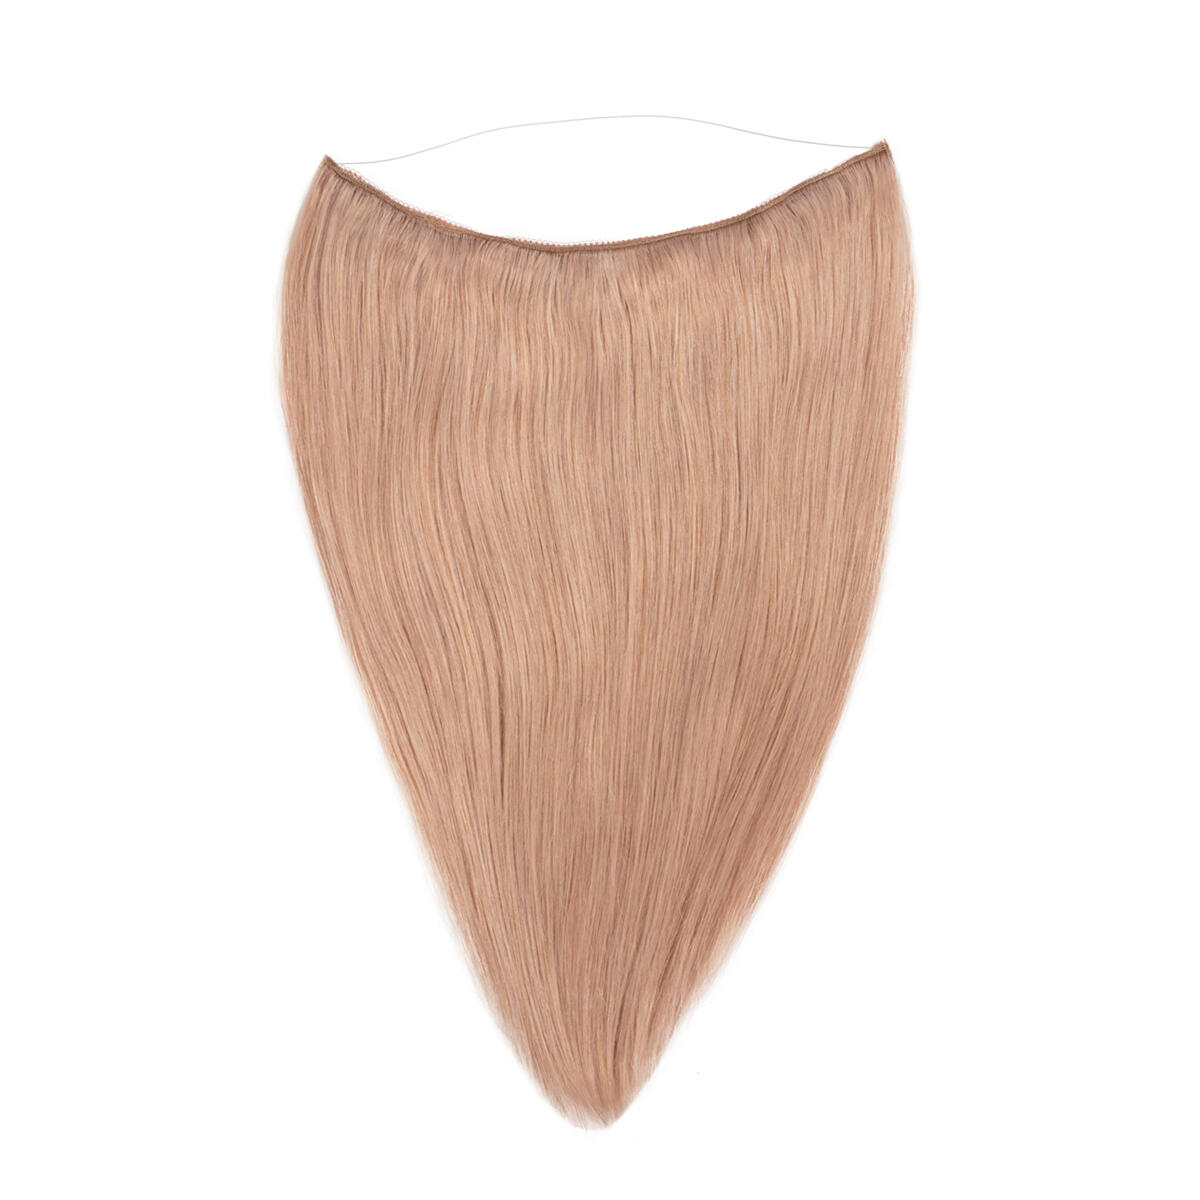 Hairband Original 7.3 Cendre Ash 45 cm